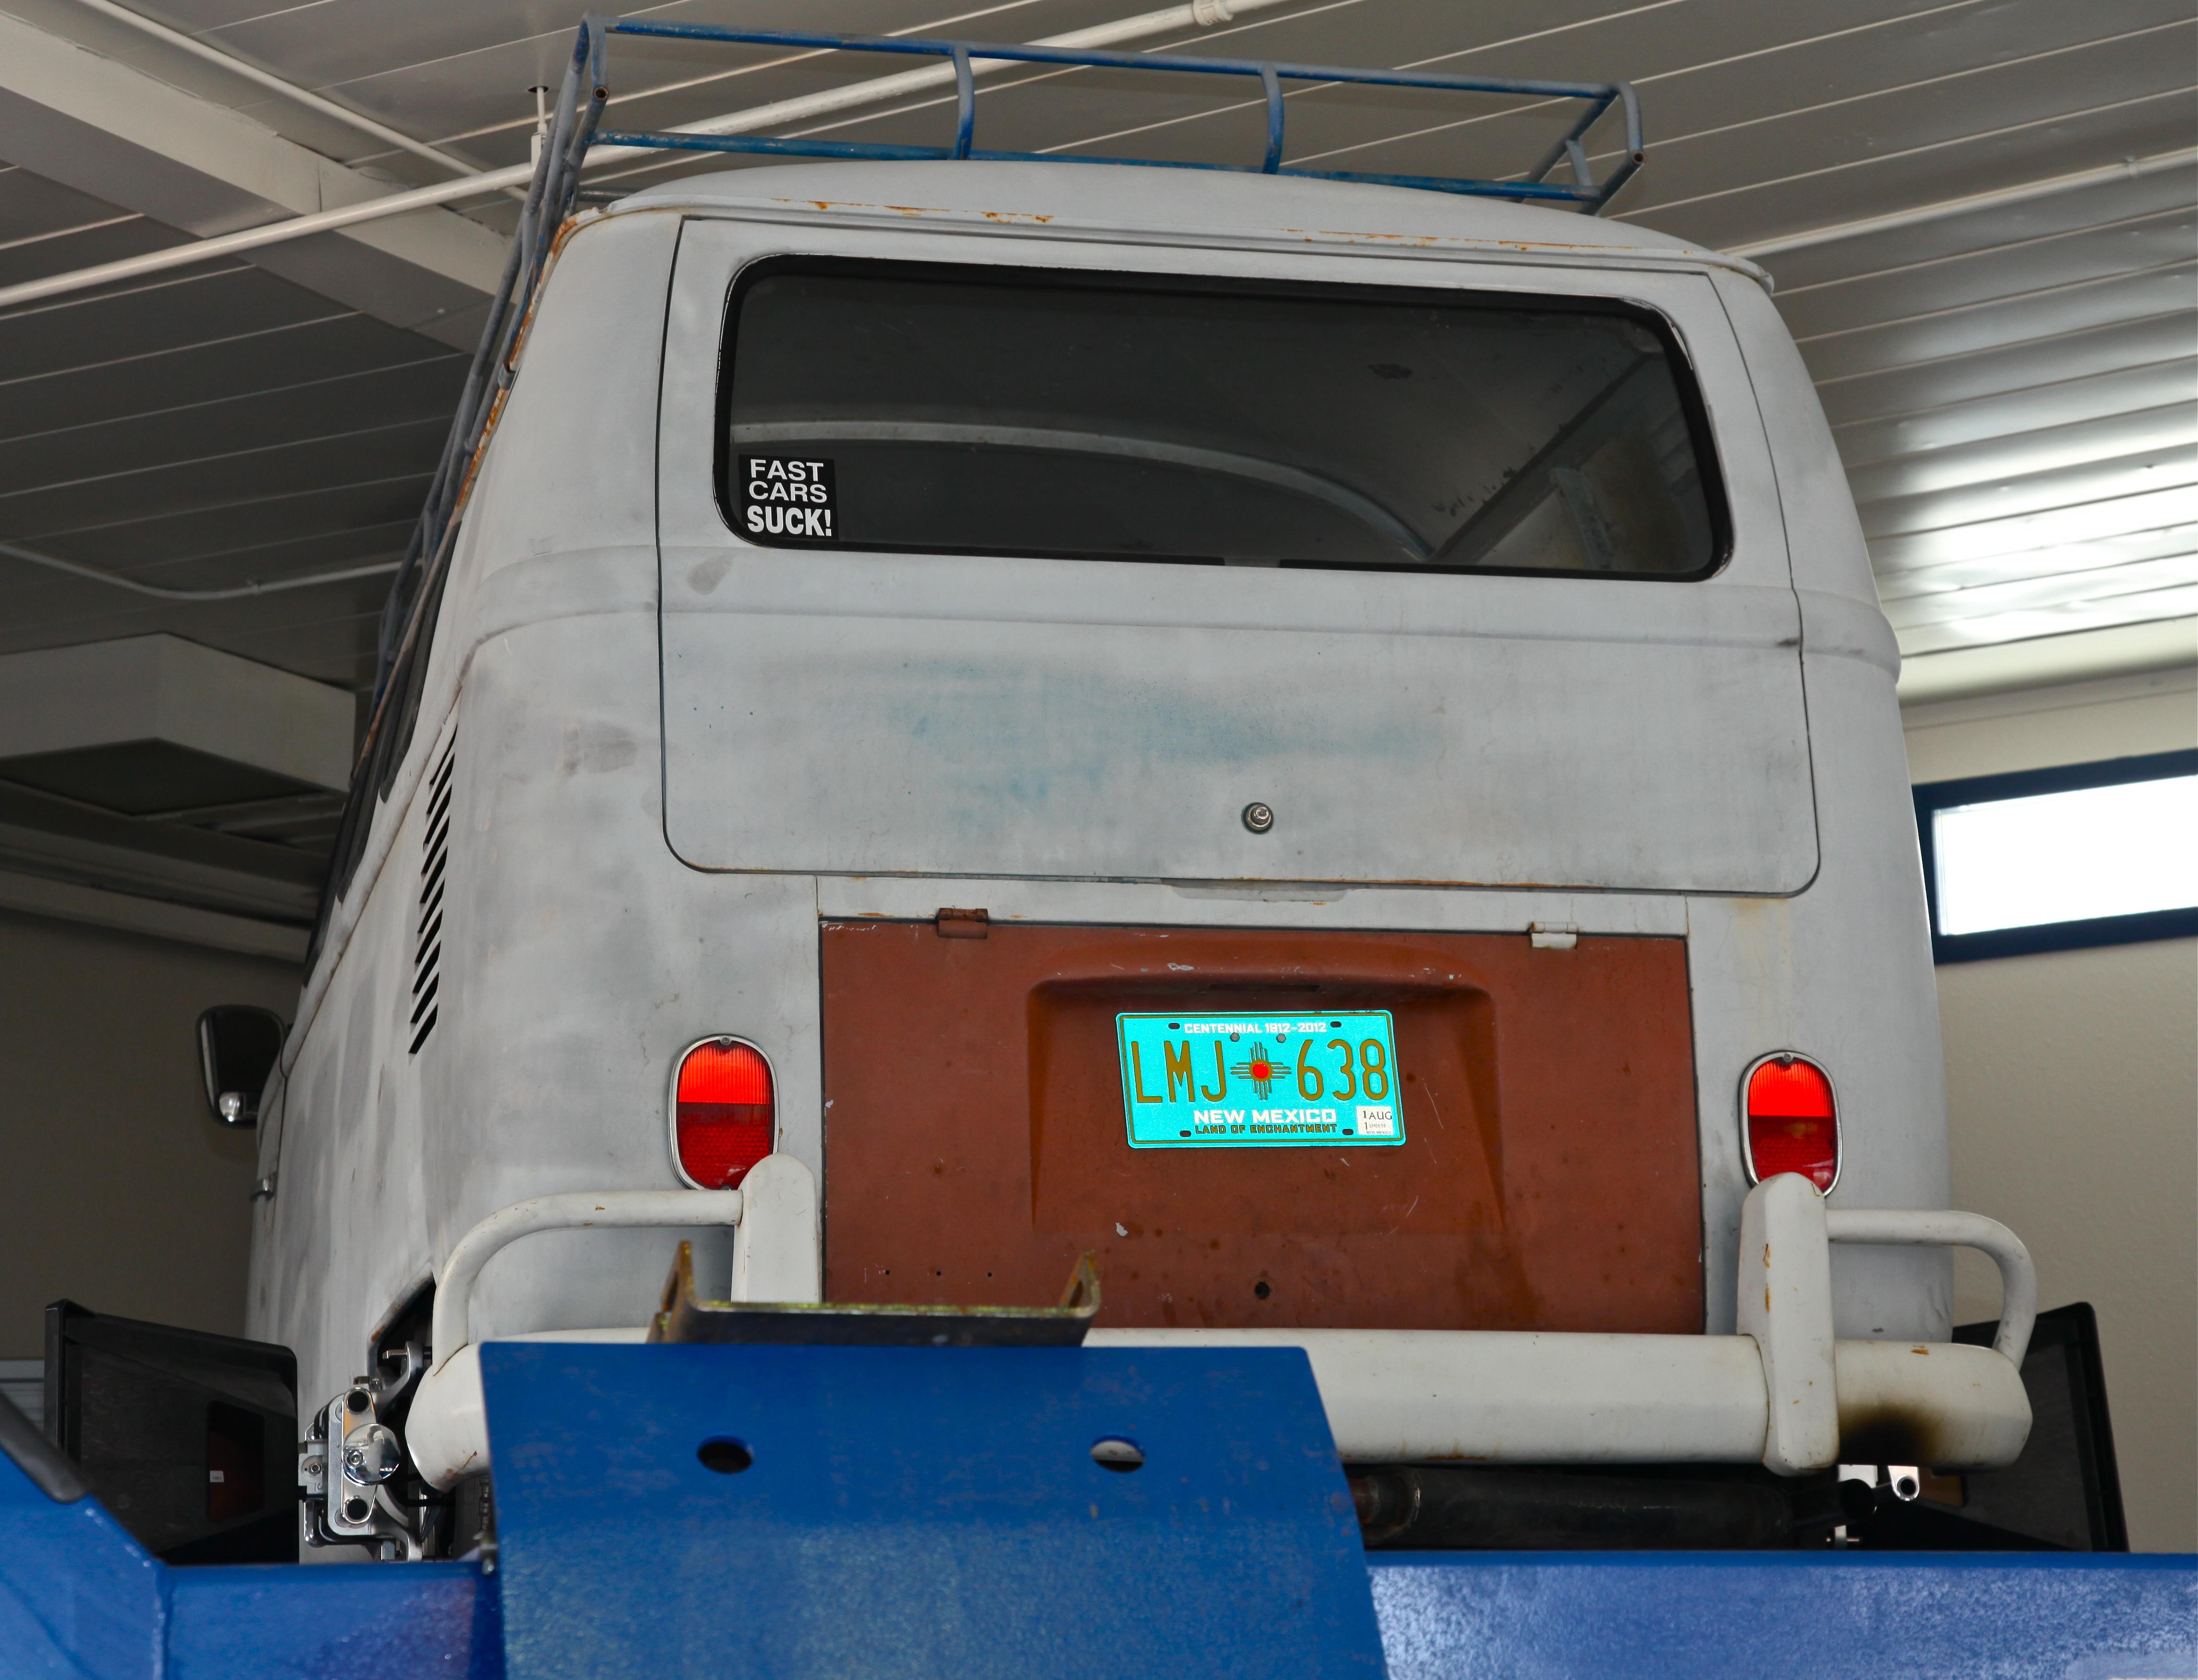 chrysler mark srt sale cherokee jeep interior grand new s for inventory albuquerque dash front casa